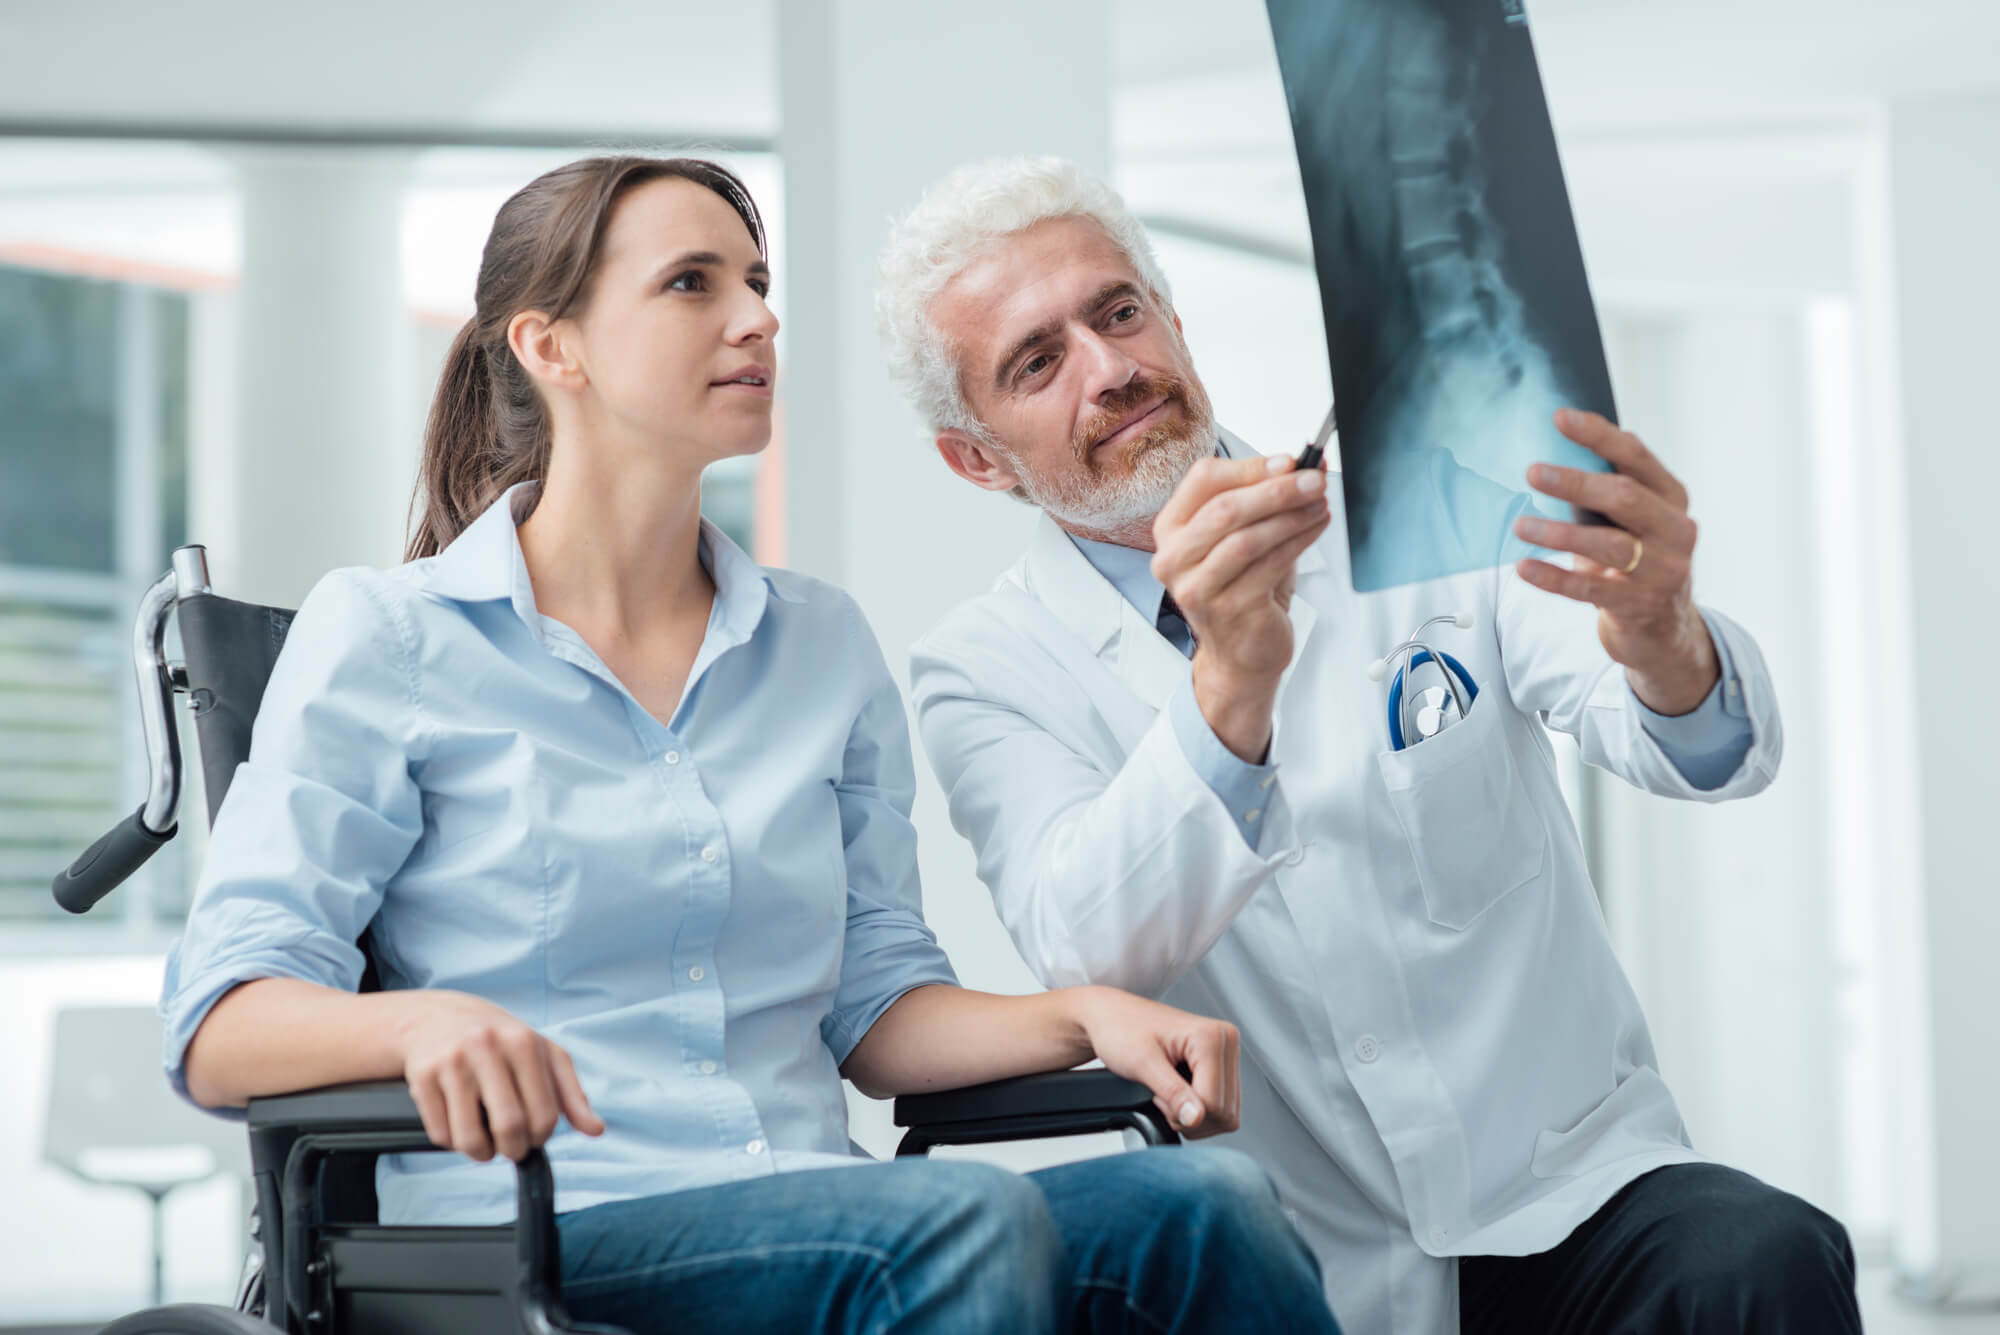 142304 Nodulo Pulmonar Conheca As Causas Sintomas E Tratamentos